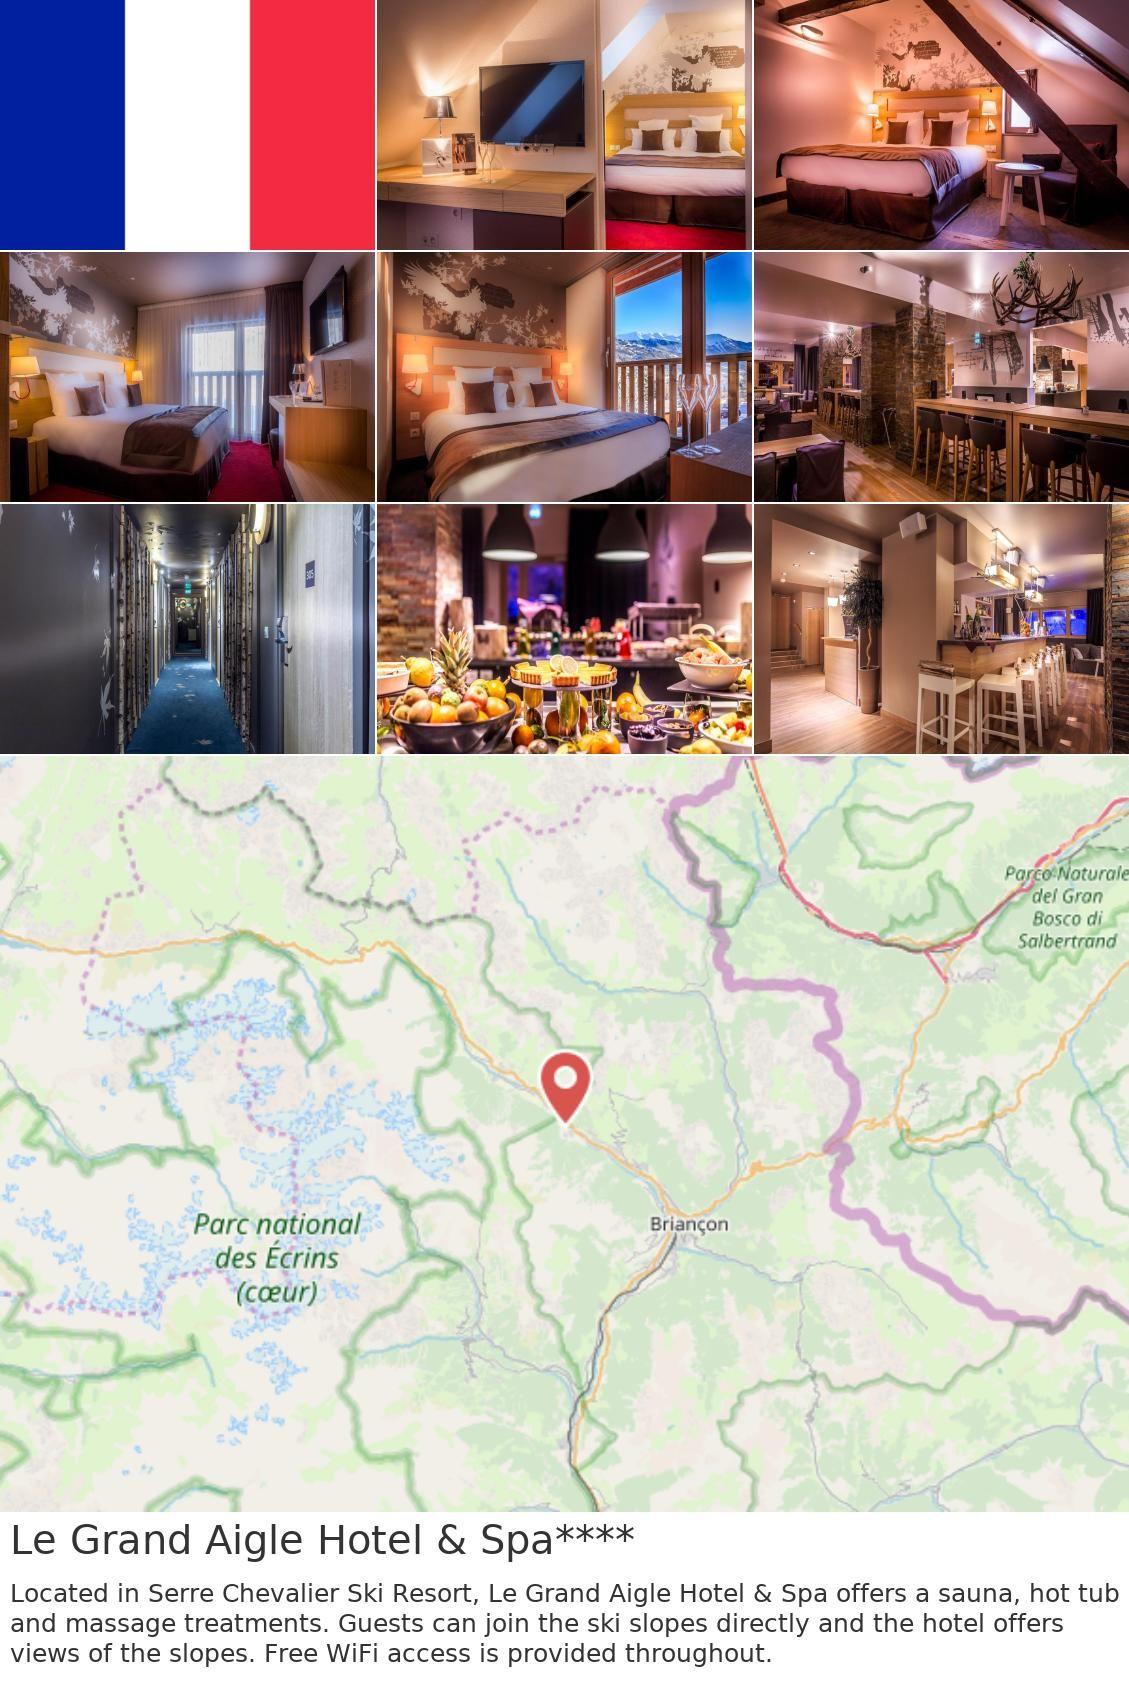 Le Grand Aigle Hotel Spa Hotel Spa Spa Offers Spa